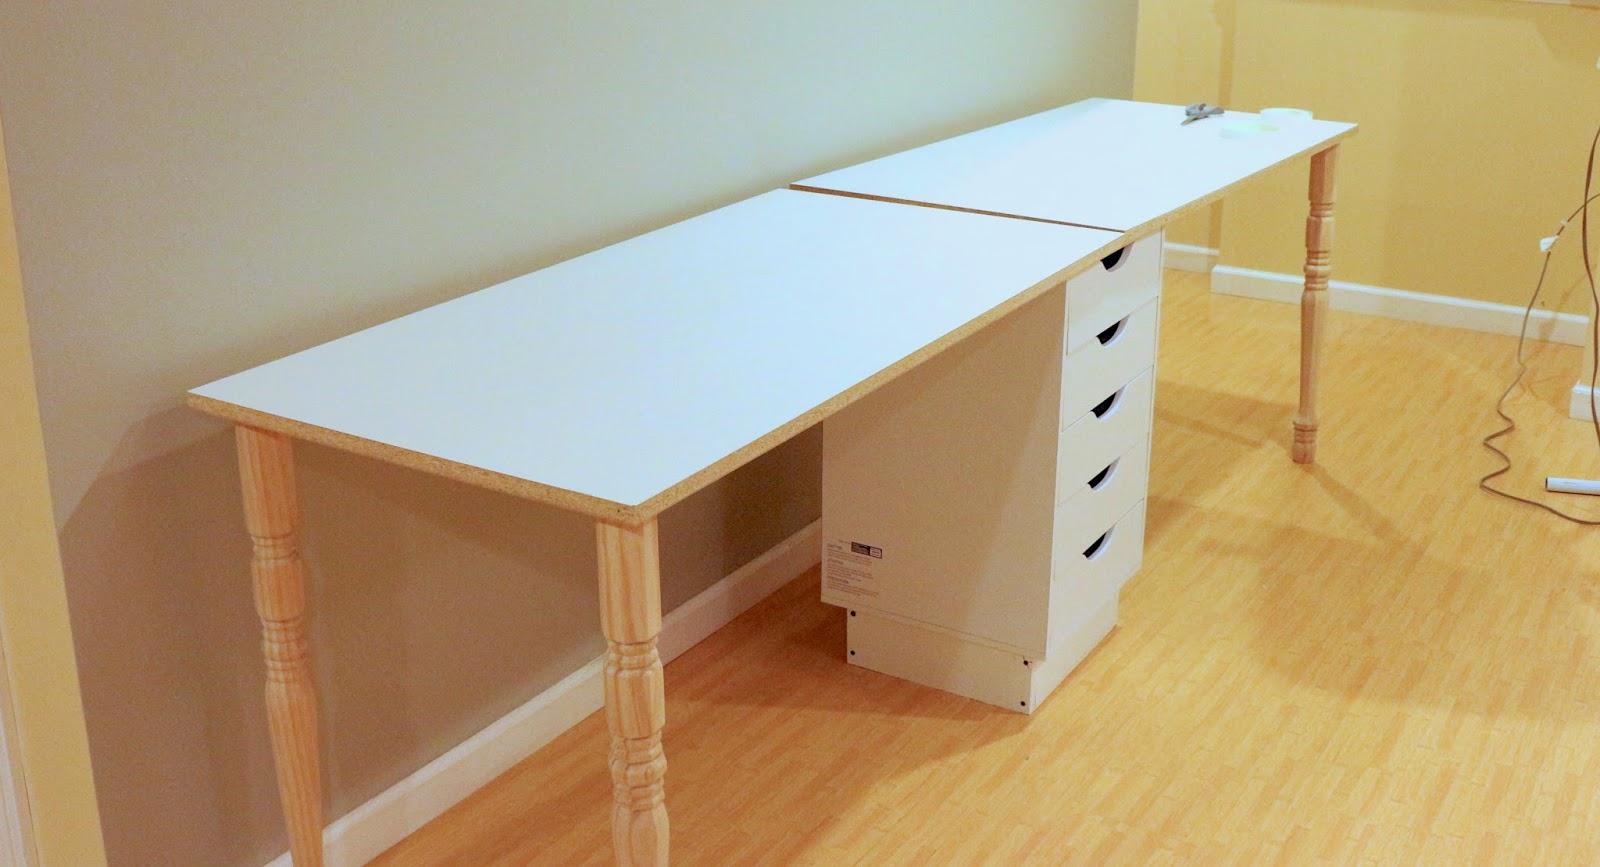 Can Desk Tops Fit Into Dorm Rooms